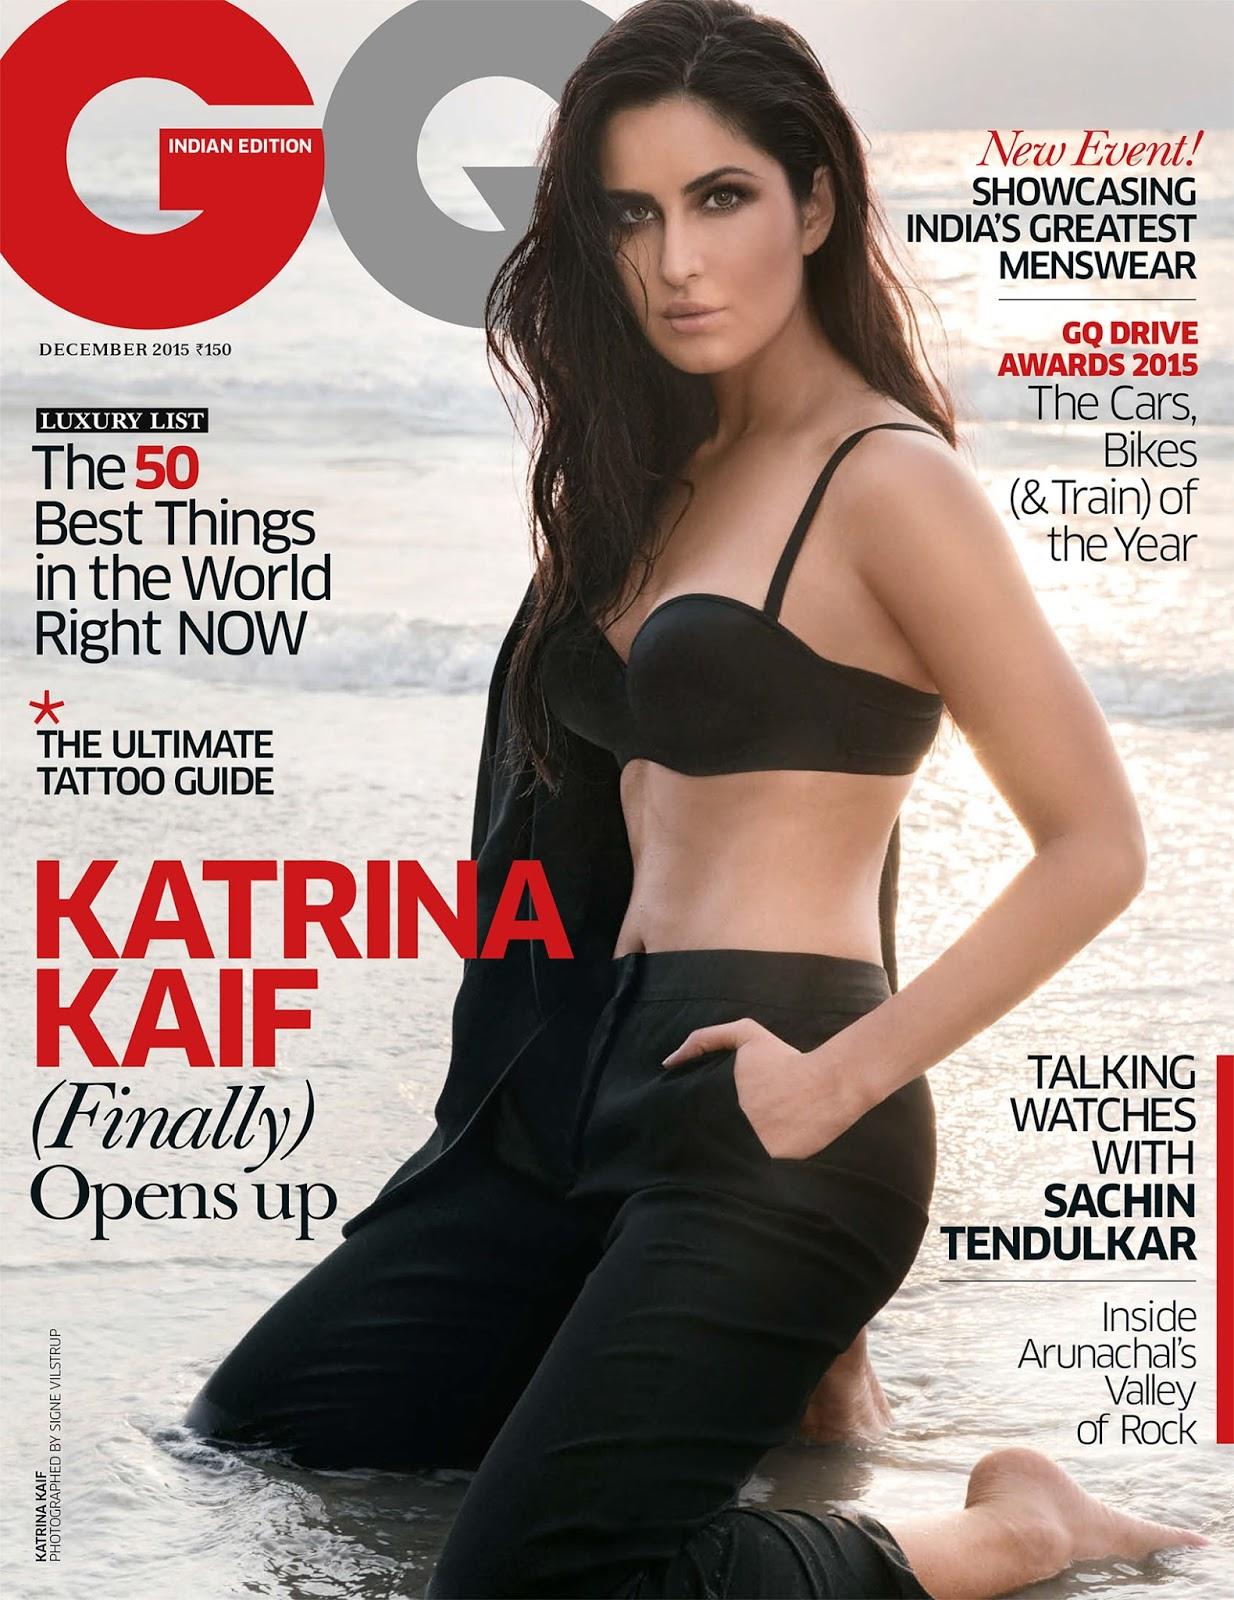 Katrina Kaif Latest Photoshoot Image